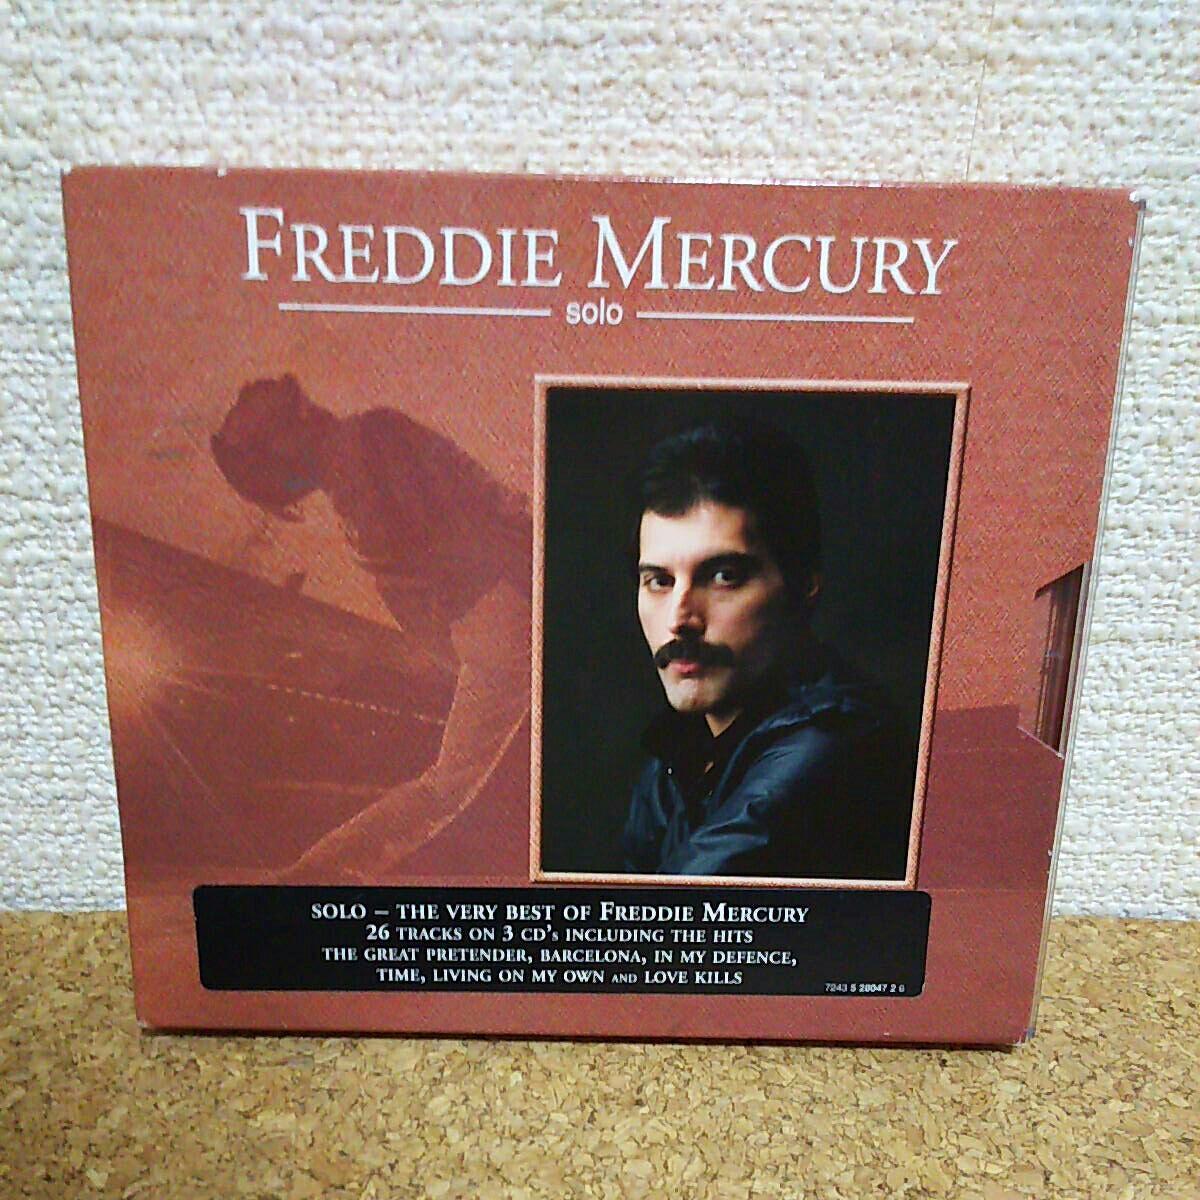 FREDDIE MERCURY/Solo 輸入盤CD3枚組 2CD+BonusCD フレディ・マーキュリー クィーン